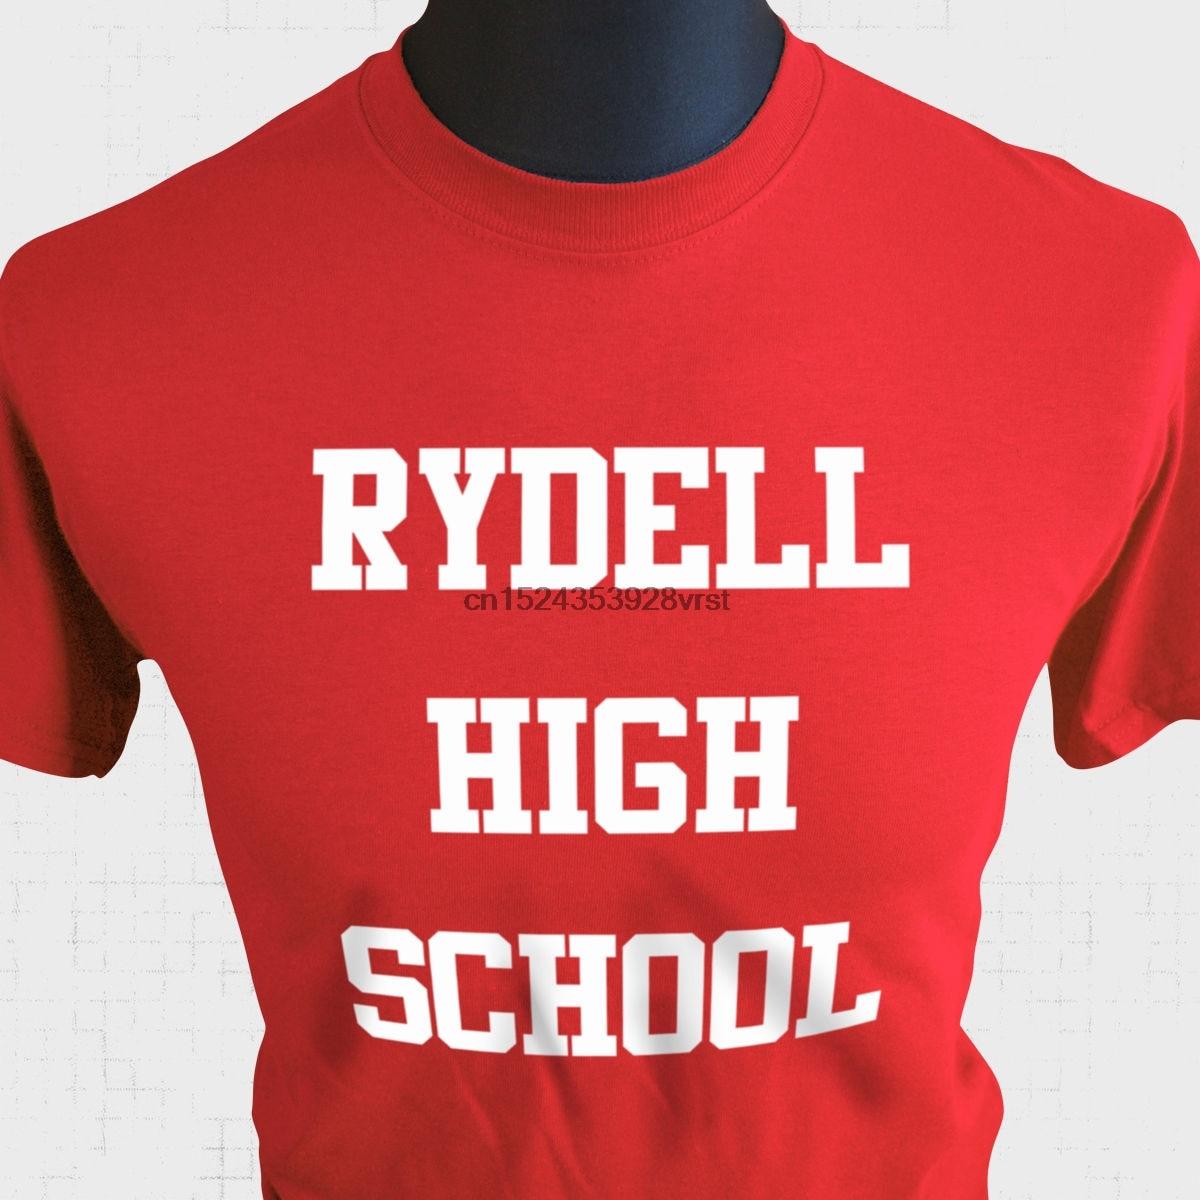 Rydell Hohe Schule T Hemd Fett Musical Phantasie Kleid John Travolta Kühlen 70 Neue T Shirts Lustige Tops T Neue unisex Lustige Tops